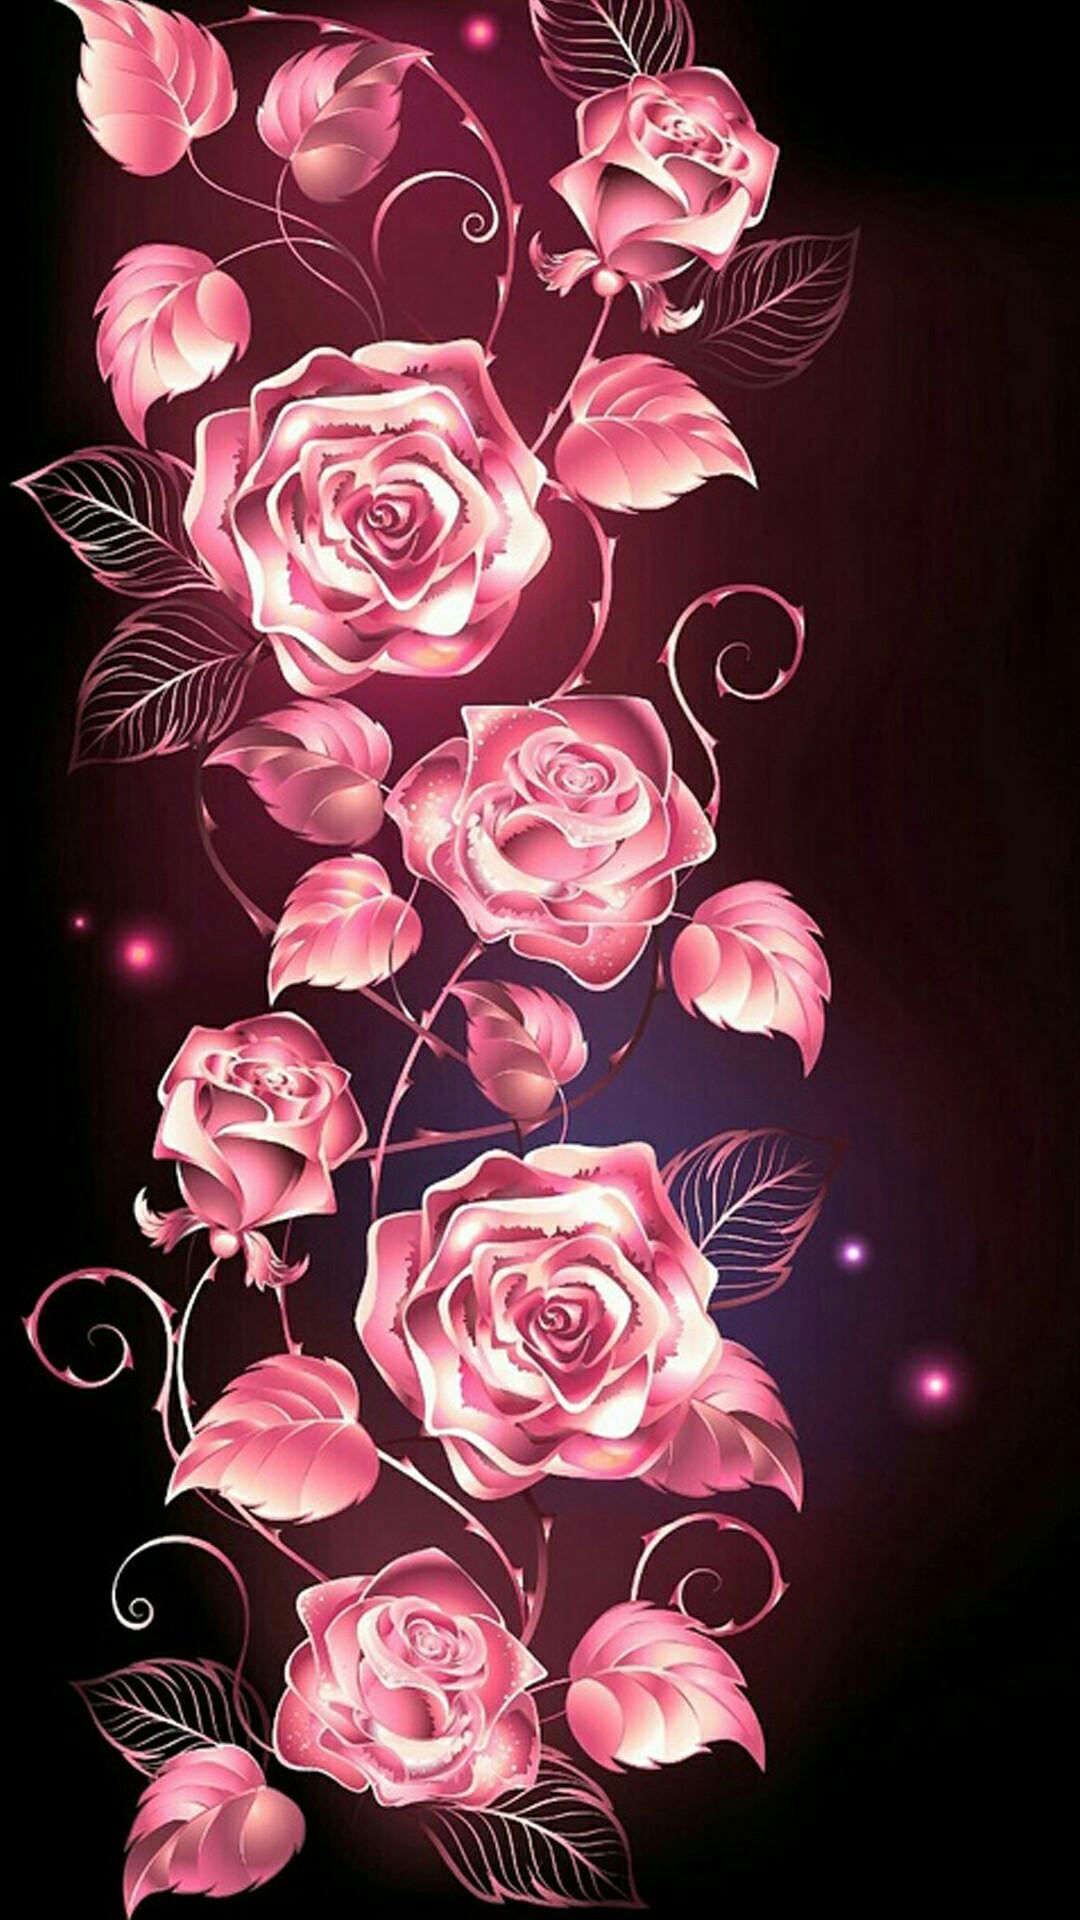 Sugar skull wallpaper for iphone 62 images - Pink rose wallpaper iphone ...